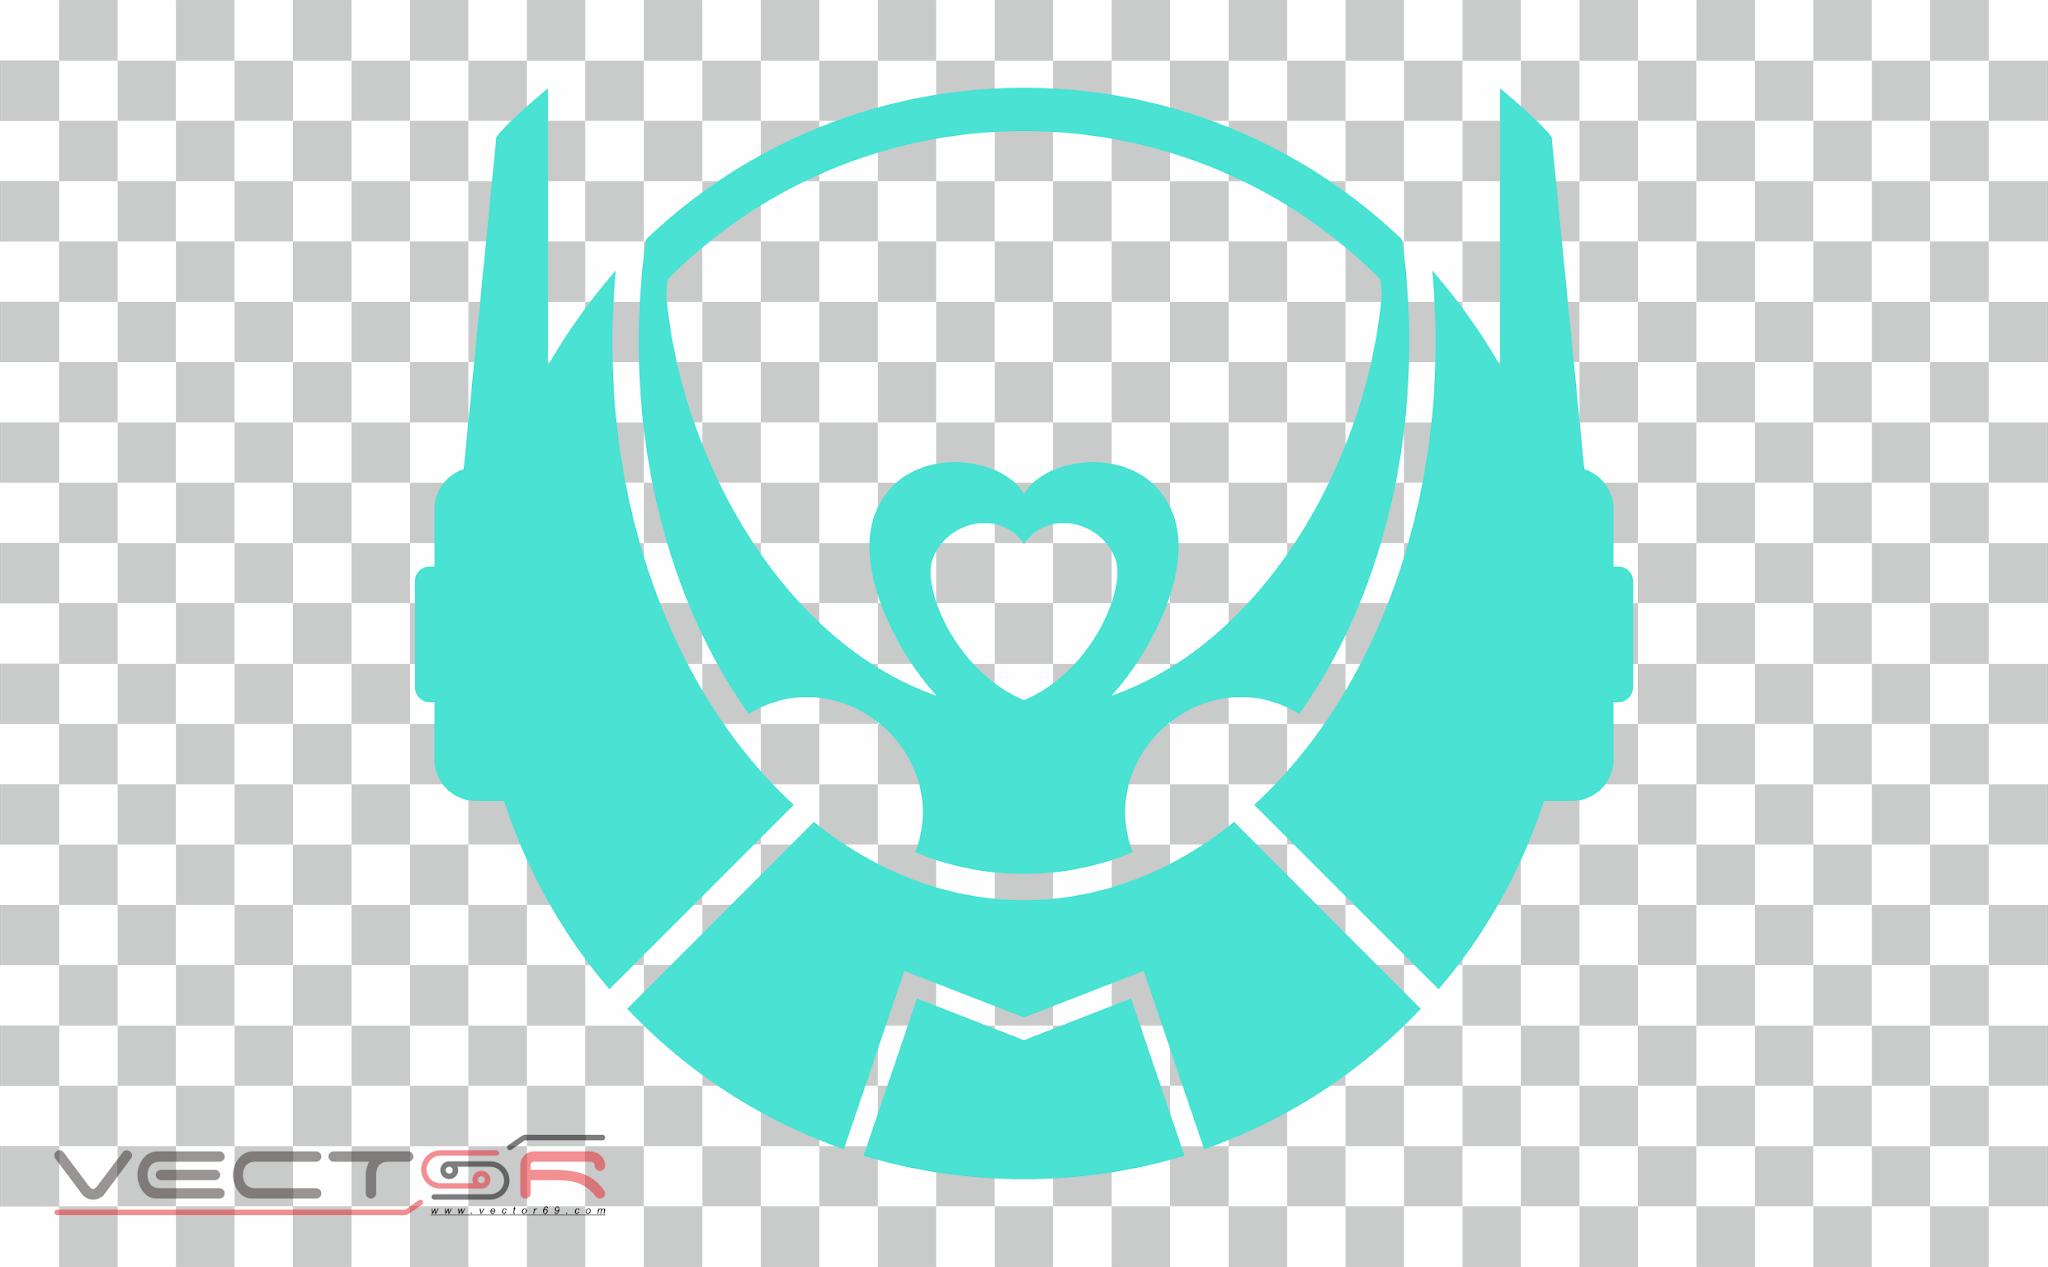 Belletron Esports Logo - Download Vector File PNG (Portable Network Graphics)